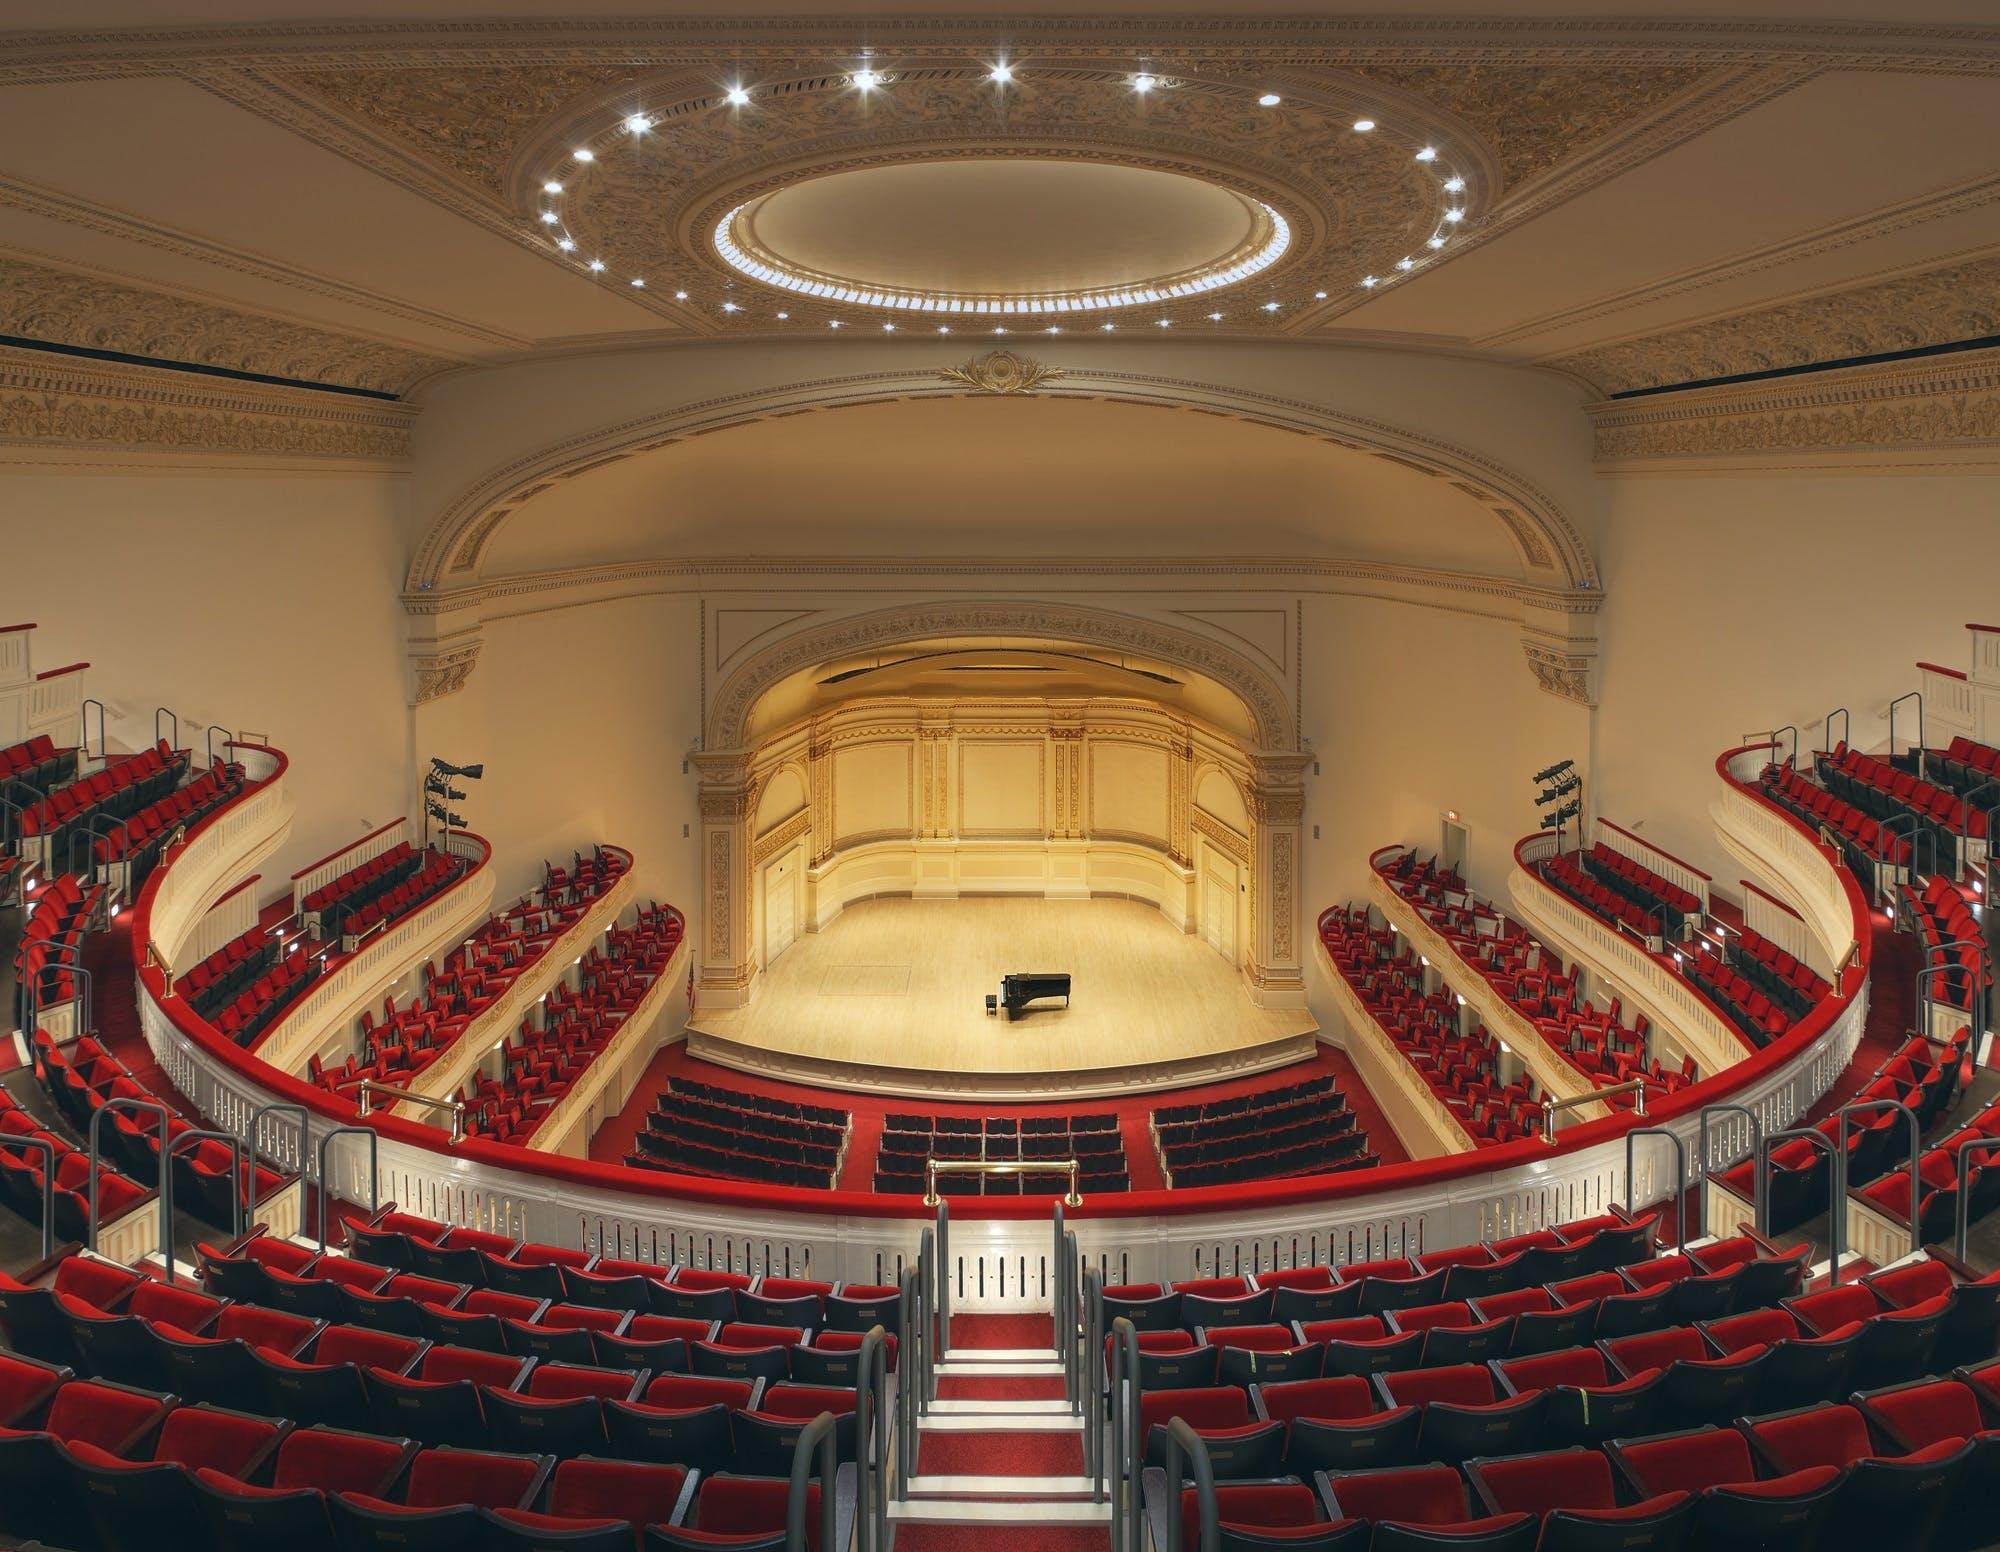 carnegie hall seating chart - Heart.impulsar.co